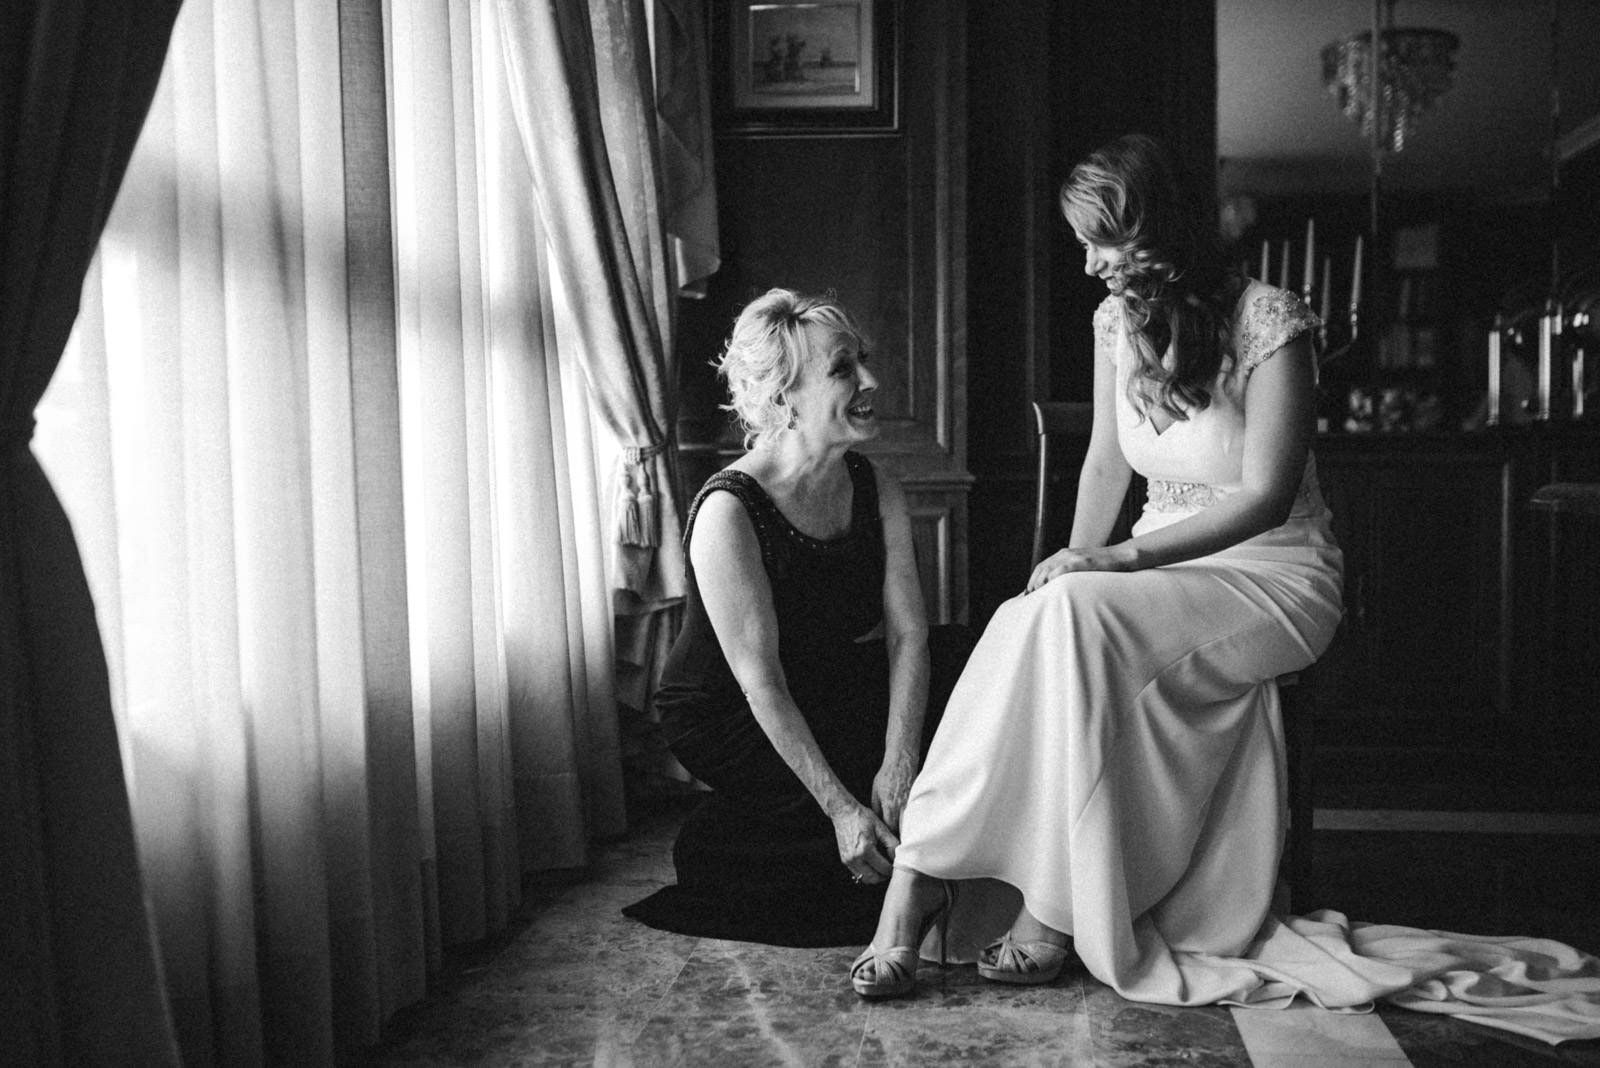 Fotografias naturales de boda en Valencia- Santi Miquel - Fotografo de boda - 002